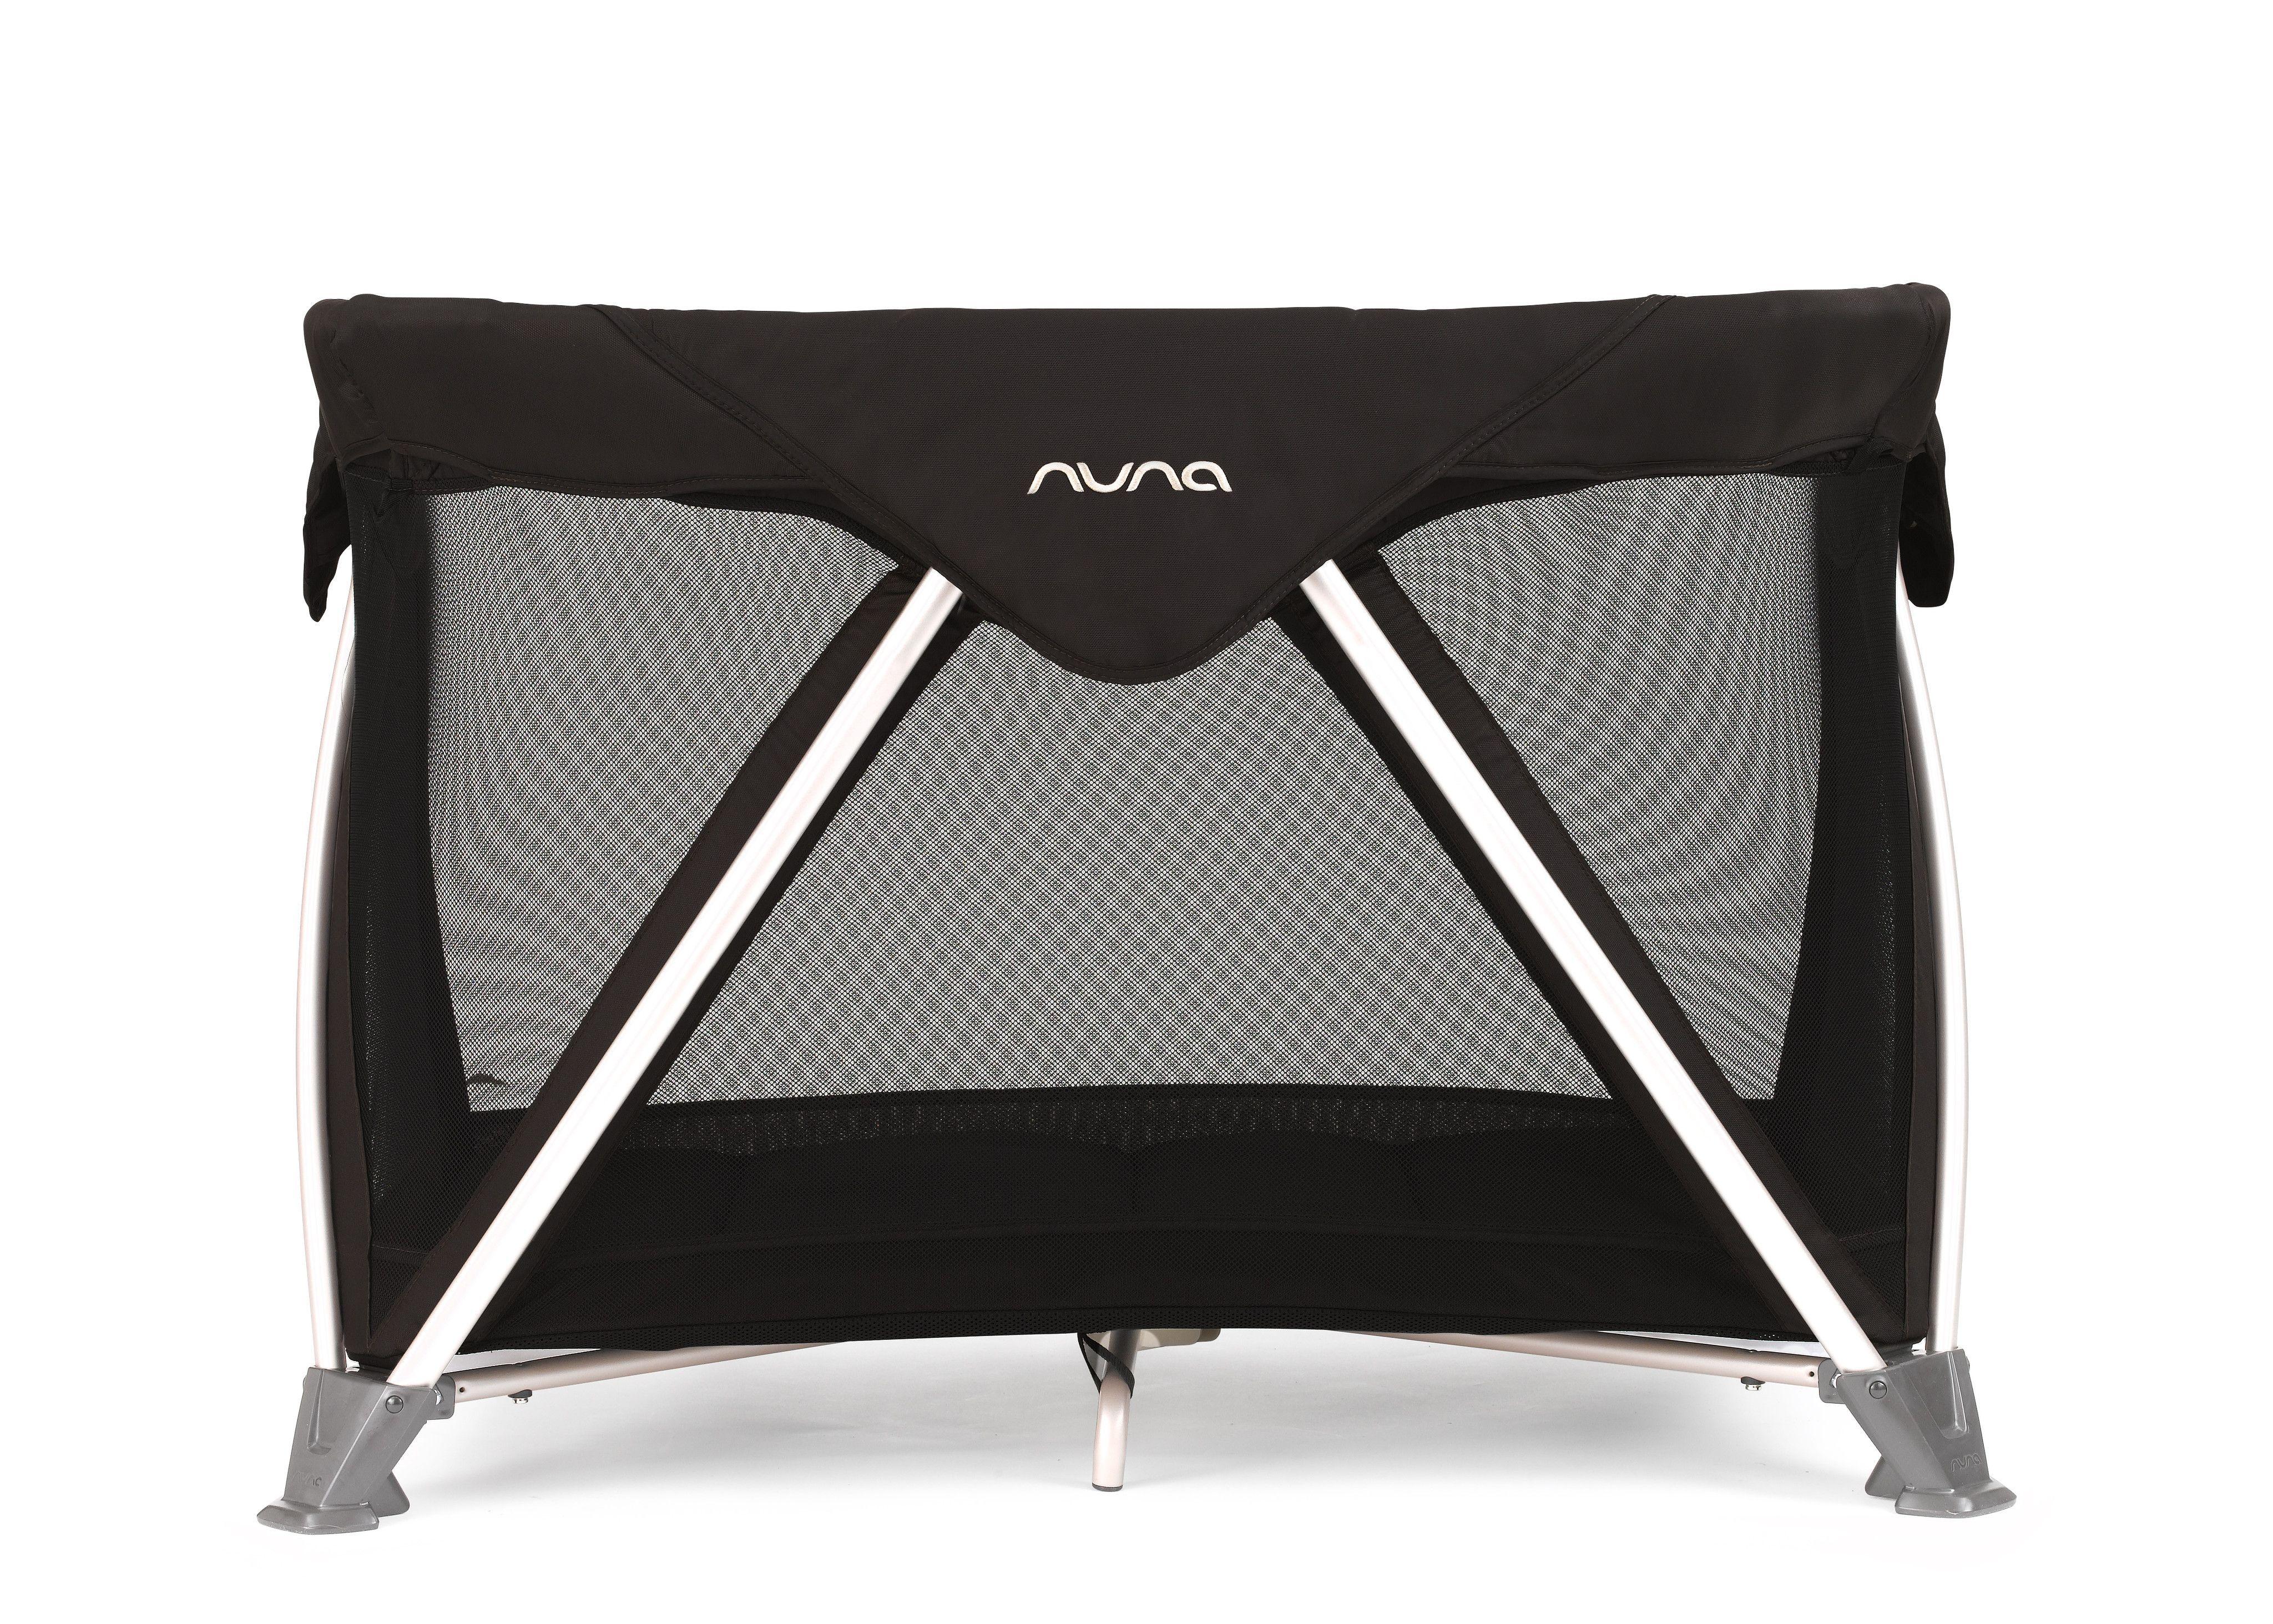 Nuna Sena AireGranite Pack, play, Baby furniture